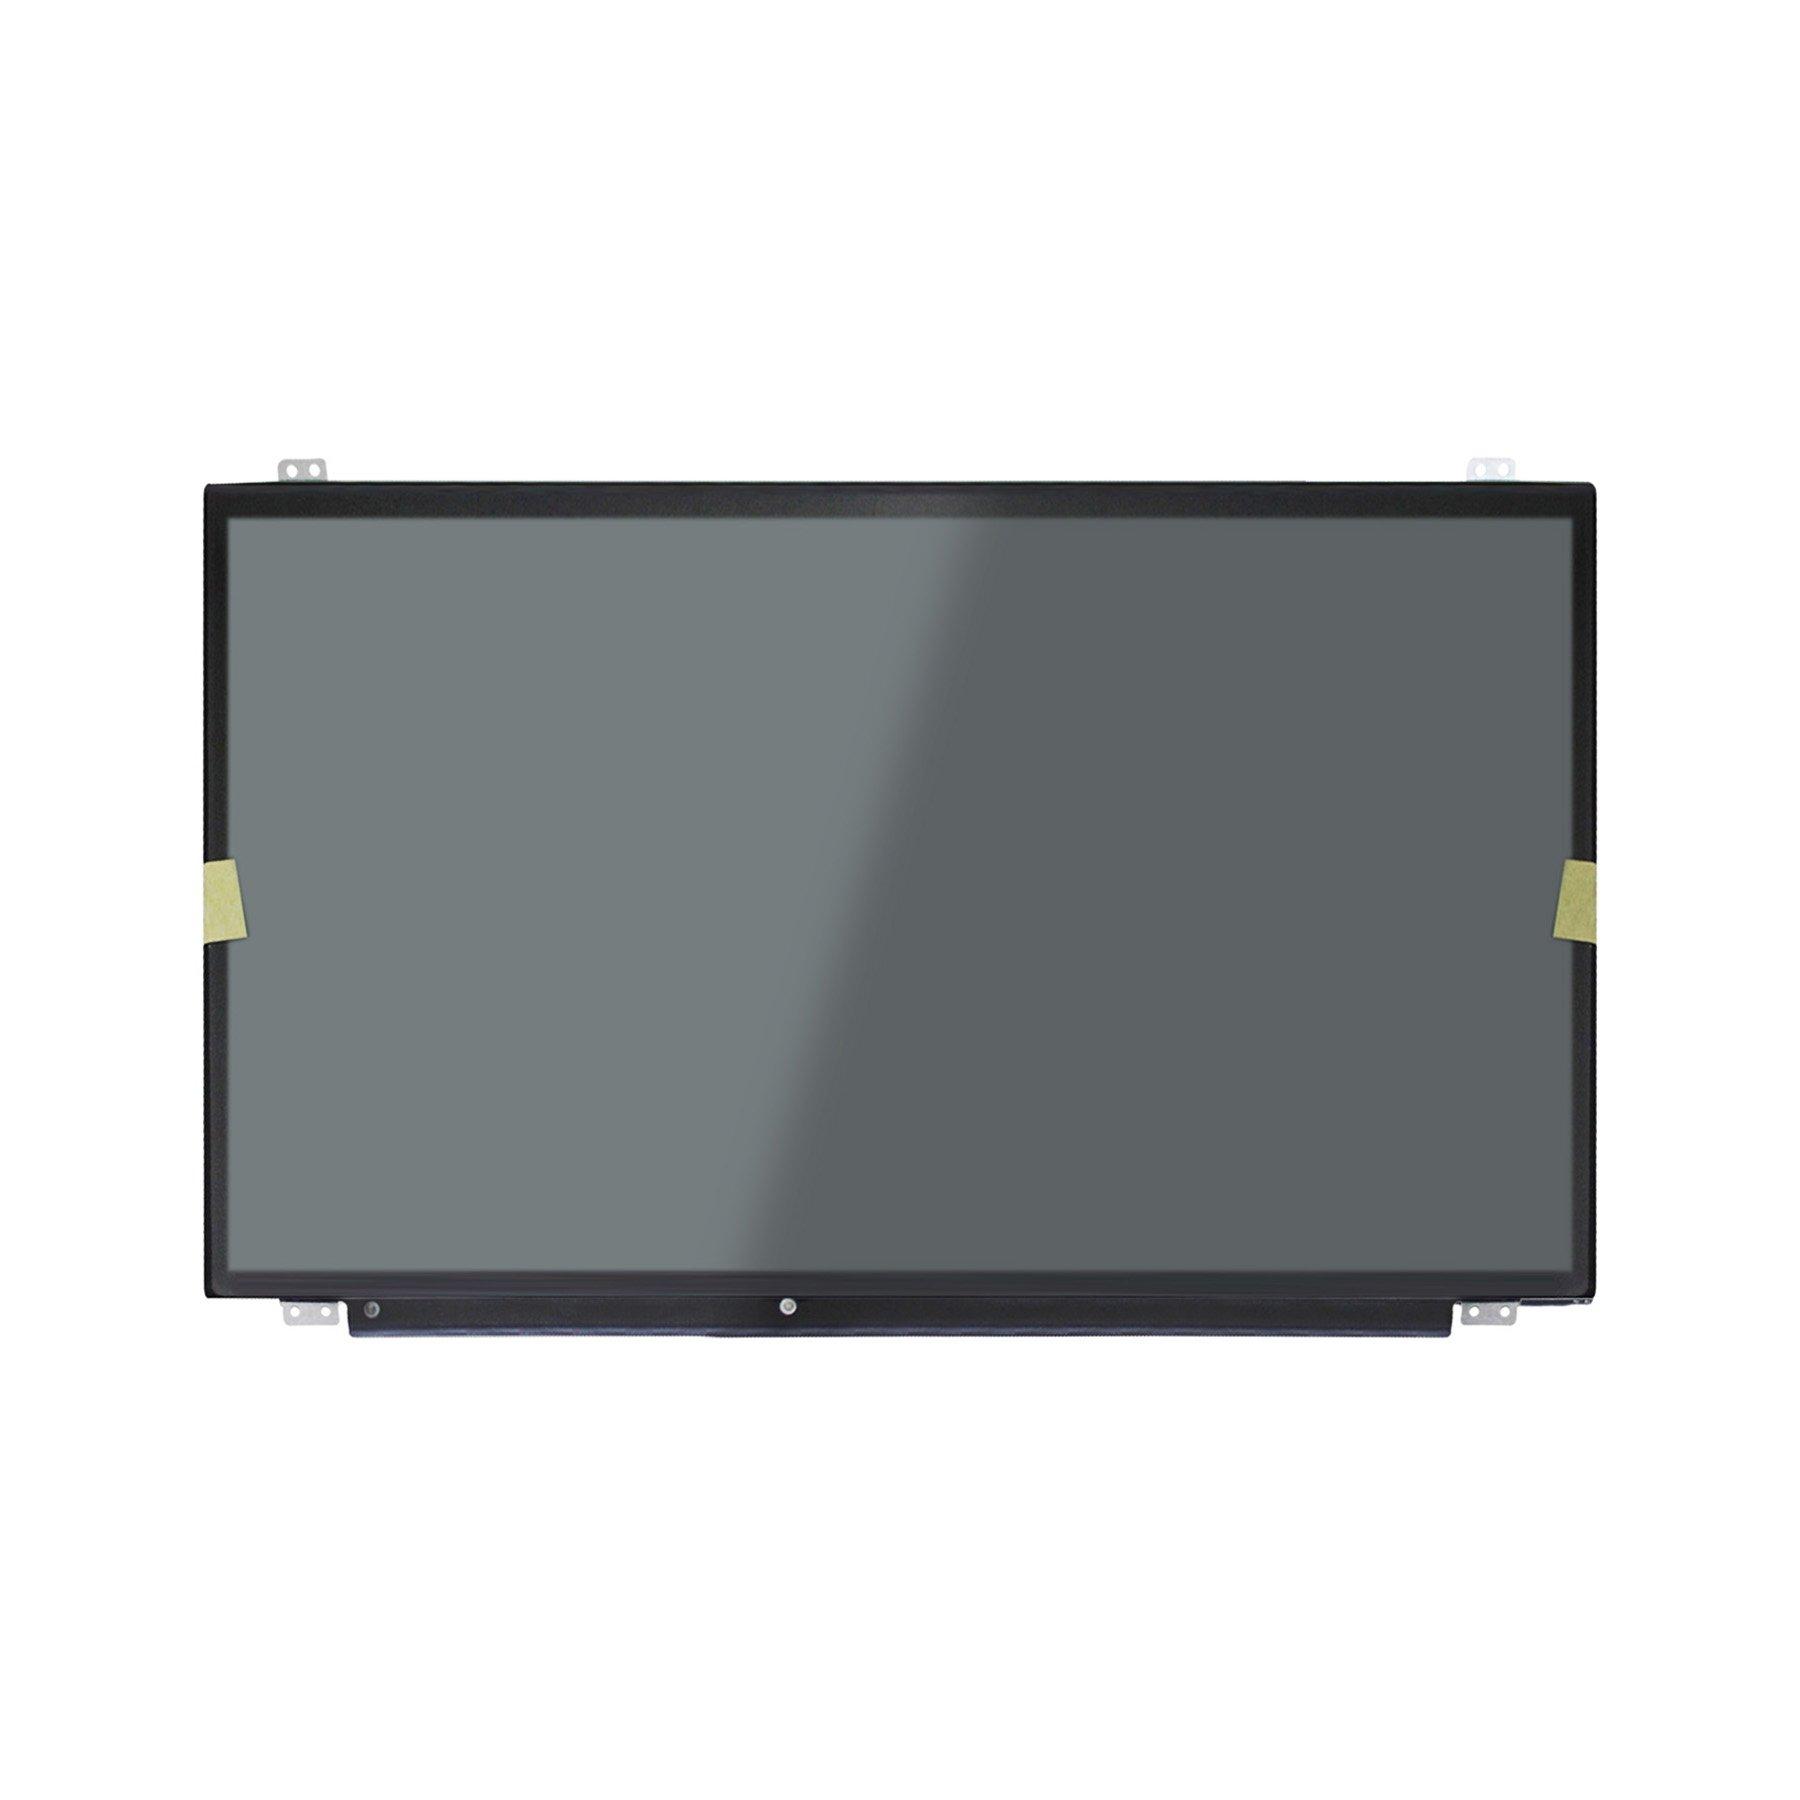 FTDLCD® 15.6 HD LCD Pantanlla Reparación de Ordenador Panel PC para LTN156AT20-T01 LTN156AT20-H01 1366x768 40PIN: Amazon.es: Electrónica